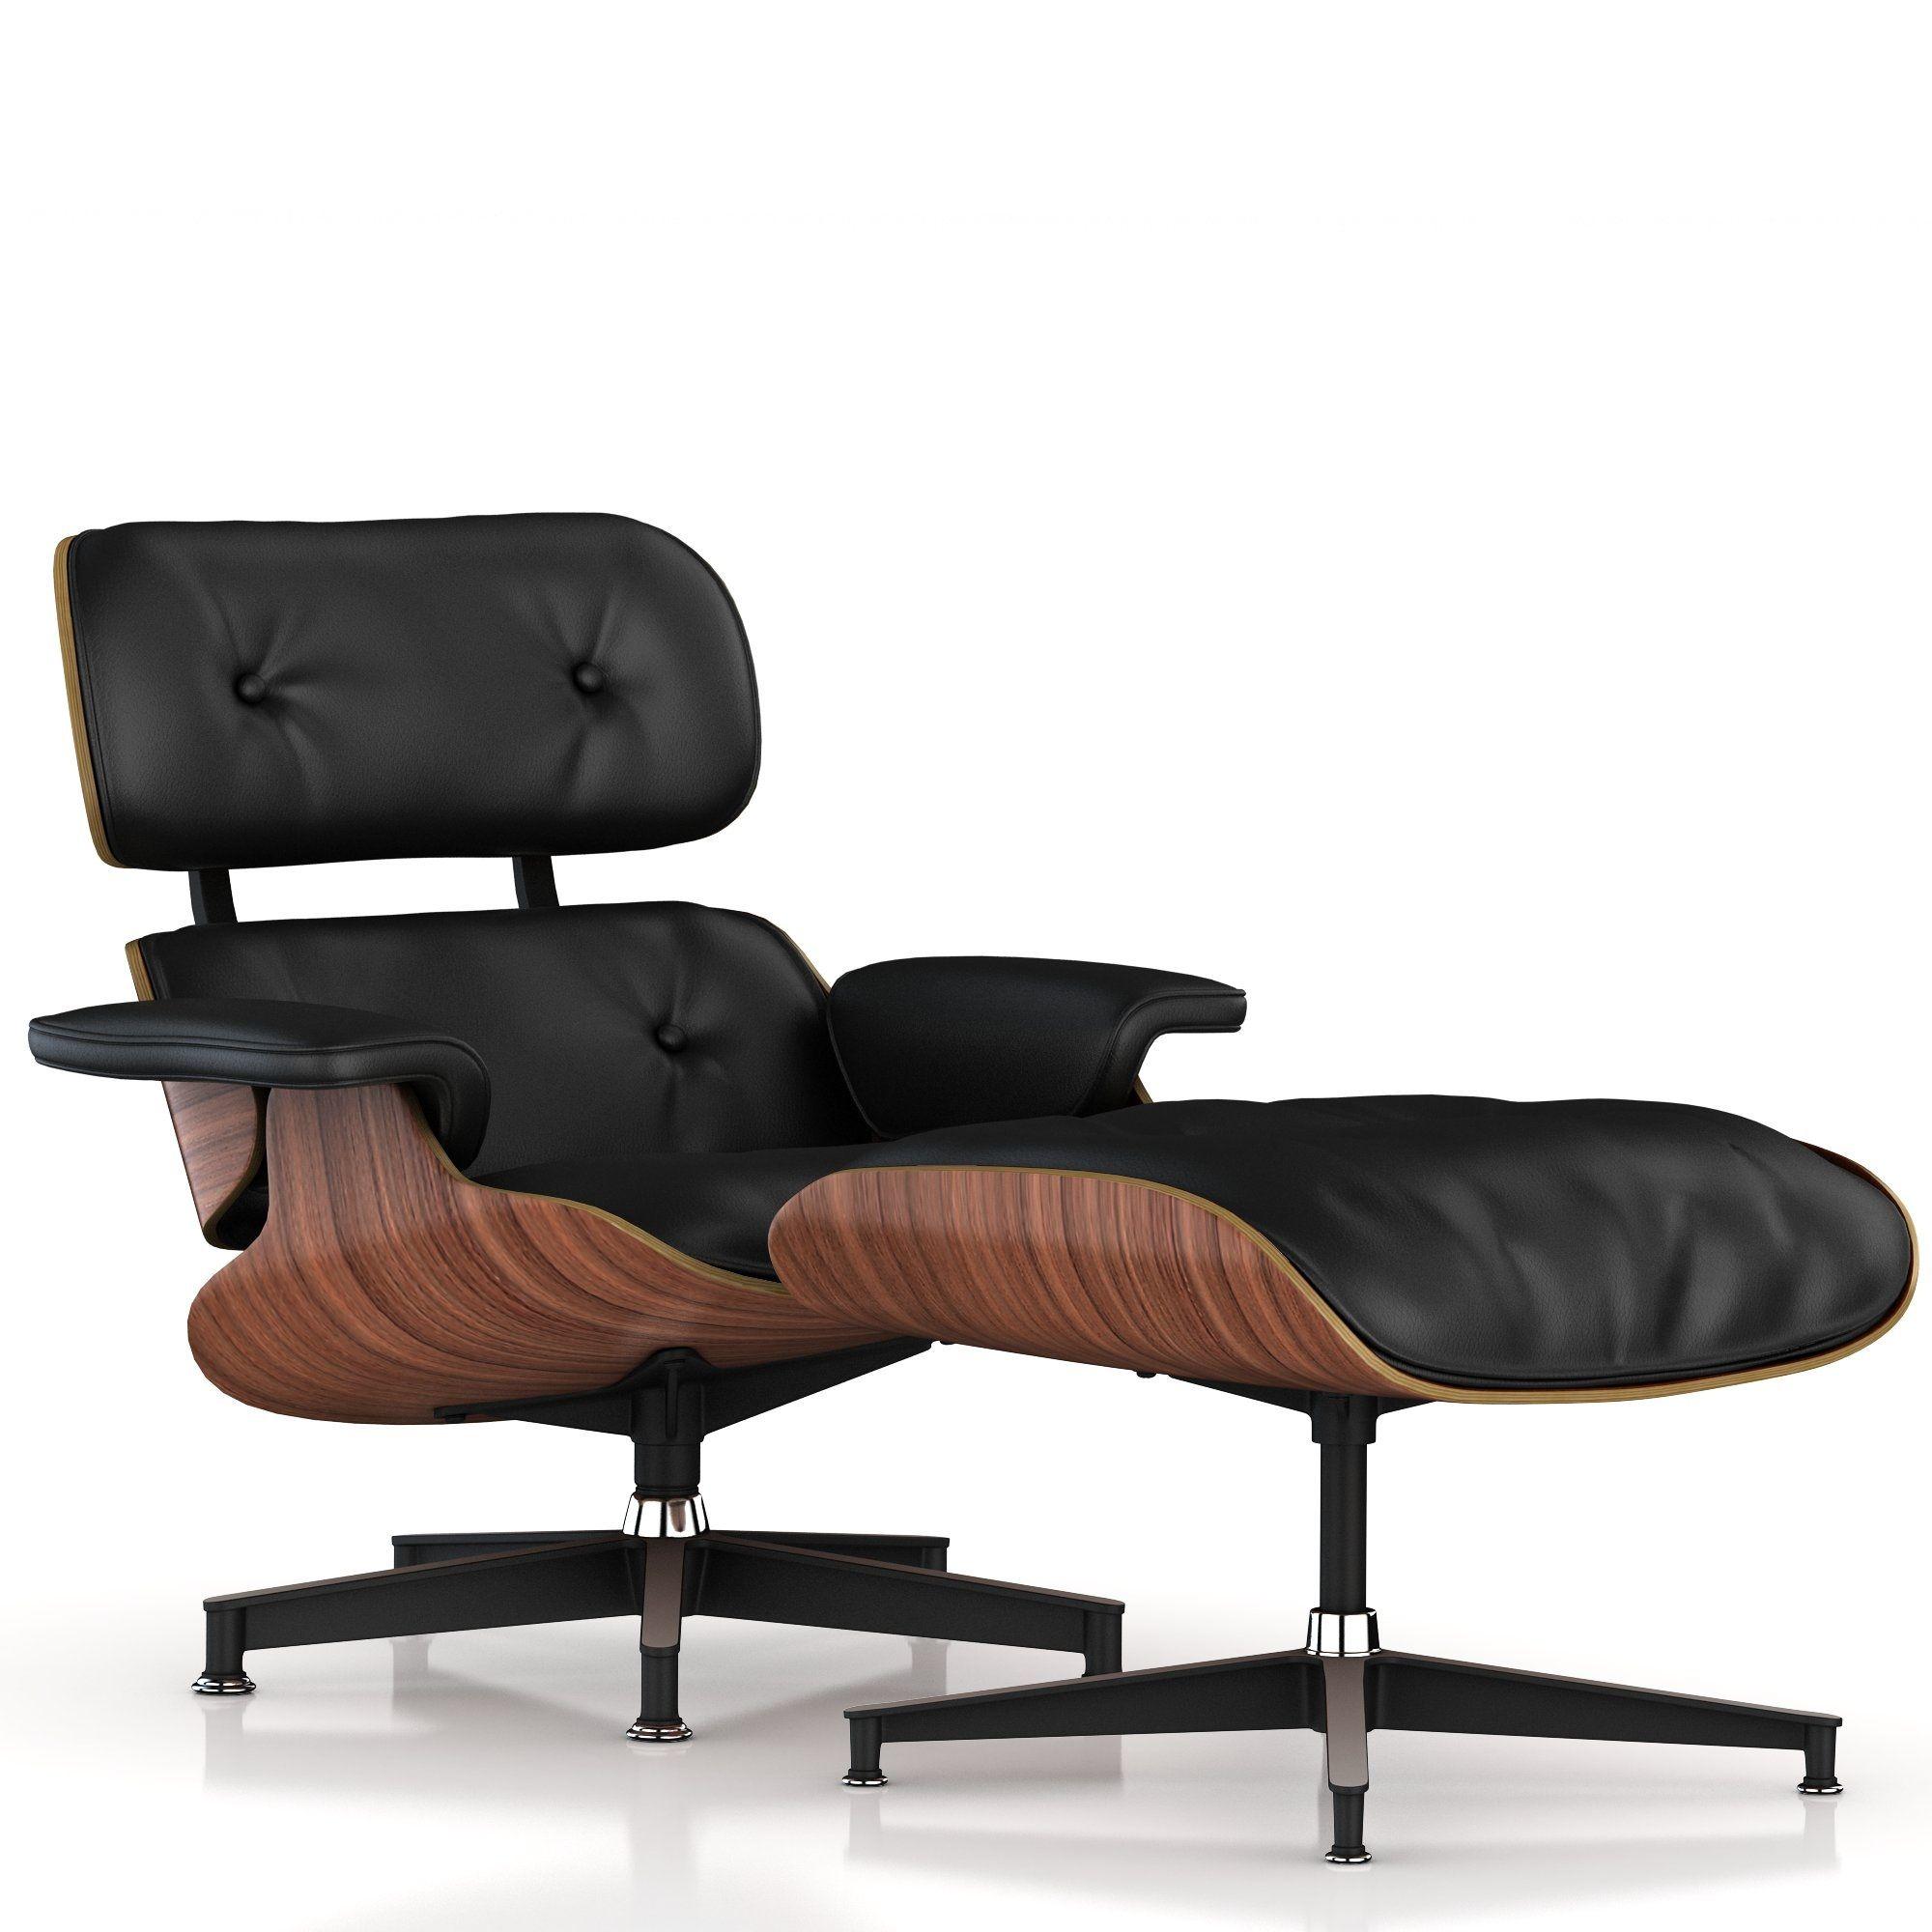 Brilliant Eames Lounge Ottoman Eames Lounge Chair And Ottoman Creativecarmelina Interior Chair Design Creativecarmelinacom